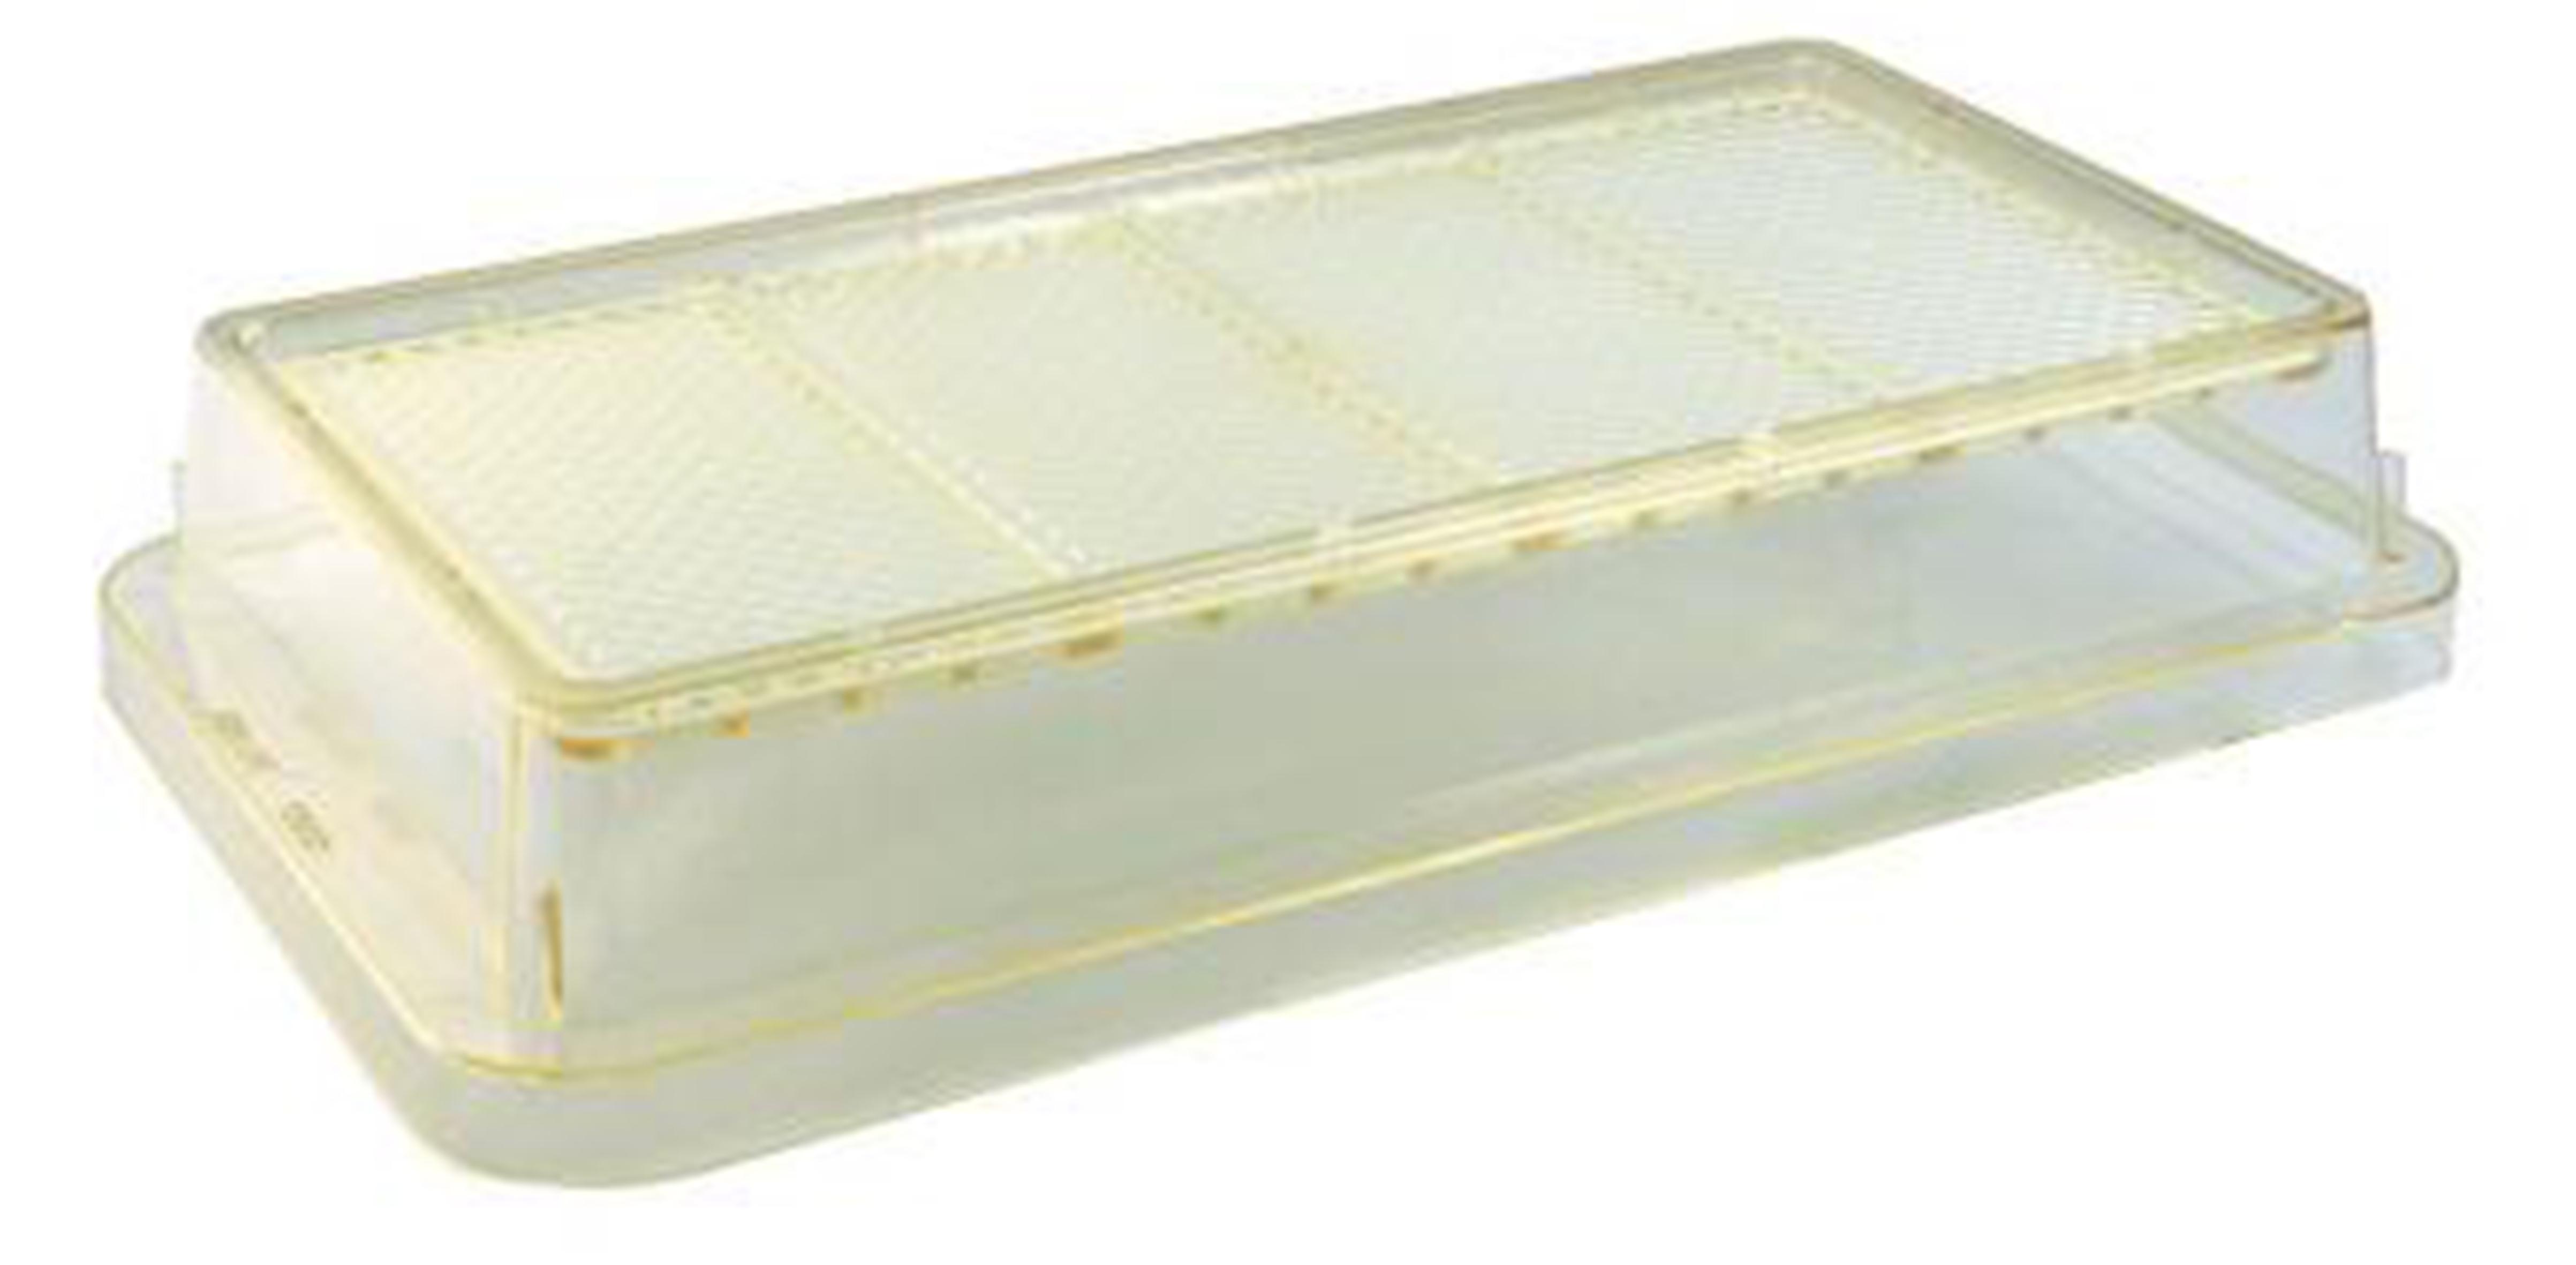 Tapa filtro ratón N40MBT policarbonato